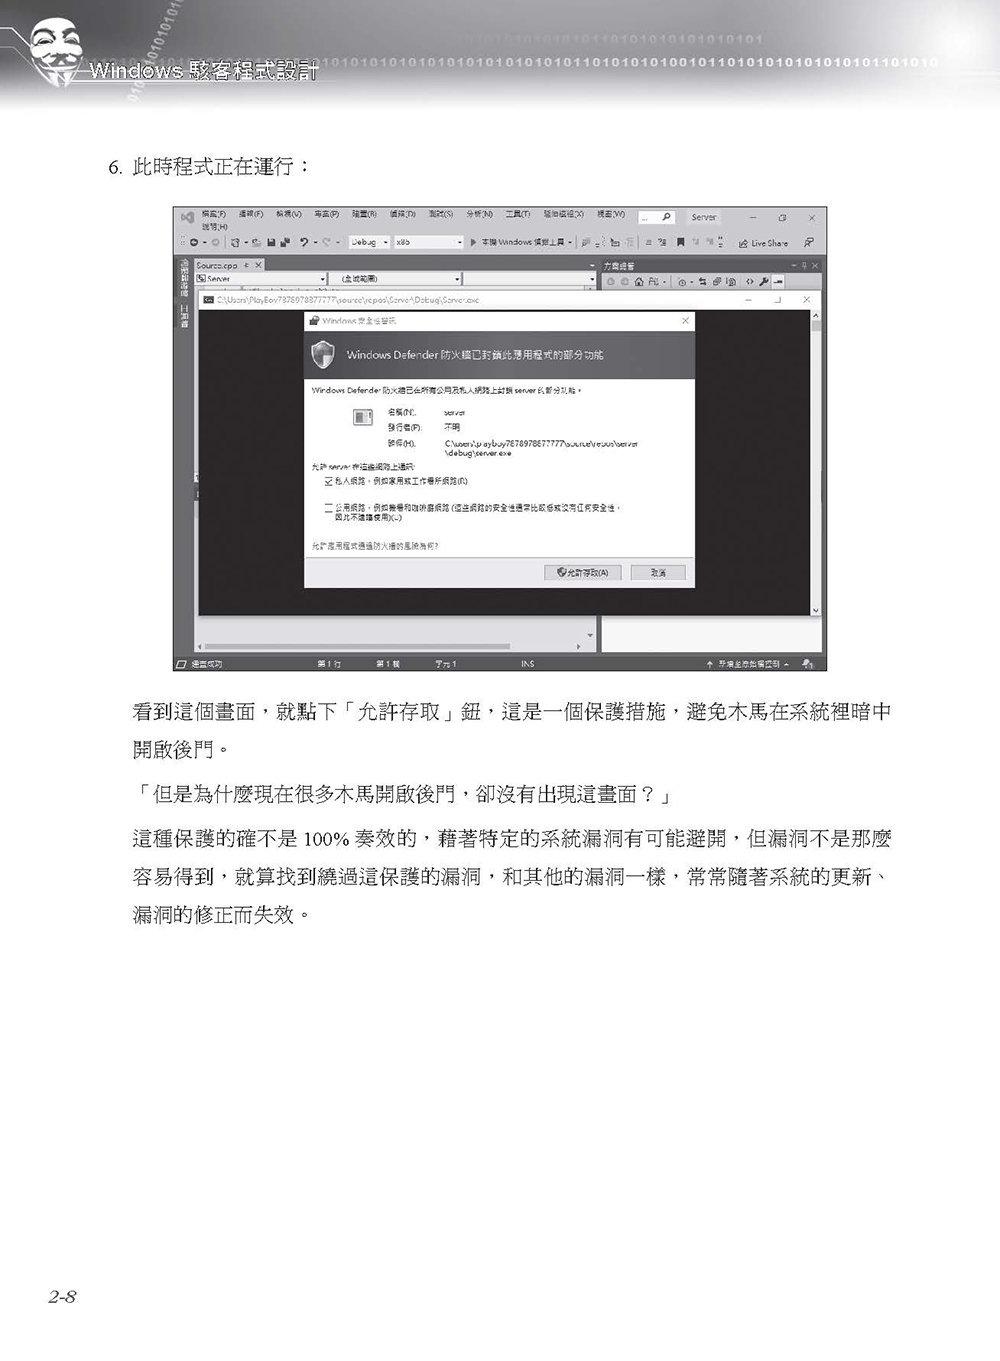 Windows 駭客程式設計:駭客攻防及惡意程式研發 (基礎修行篇)-preview-12